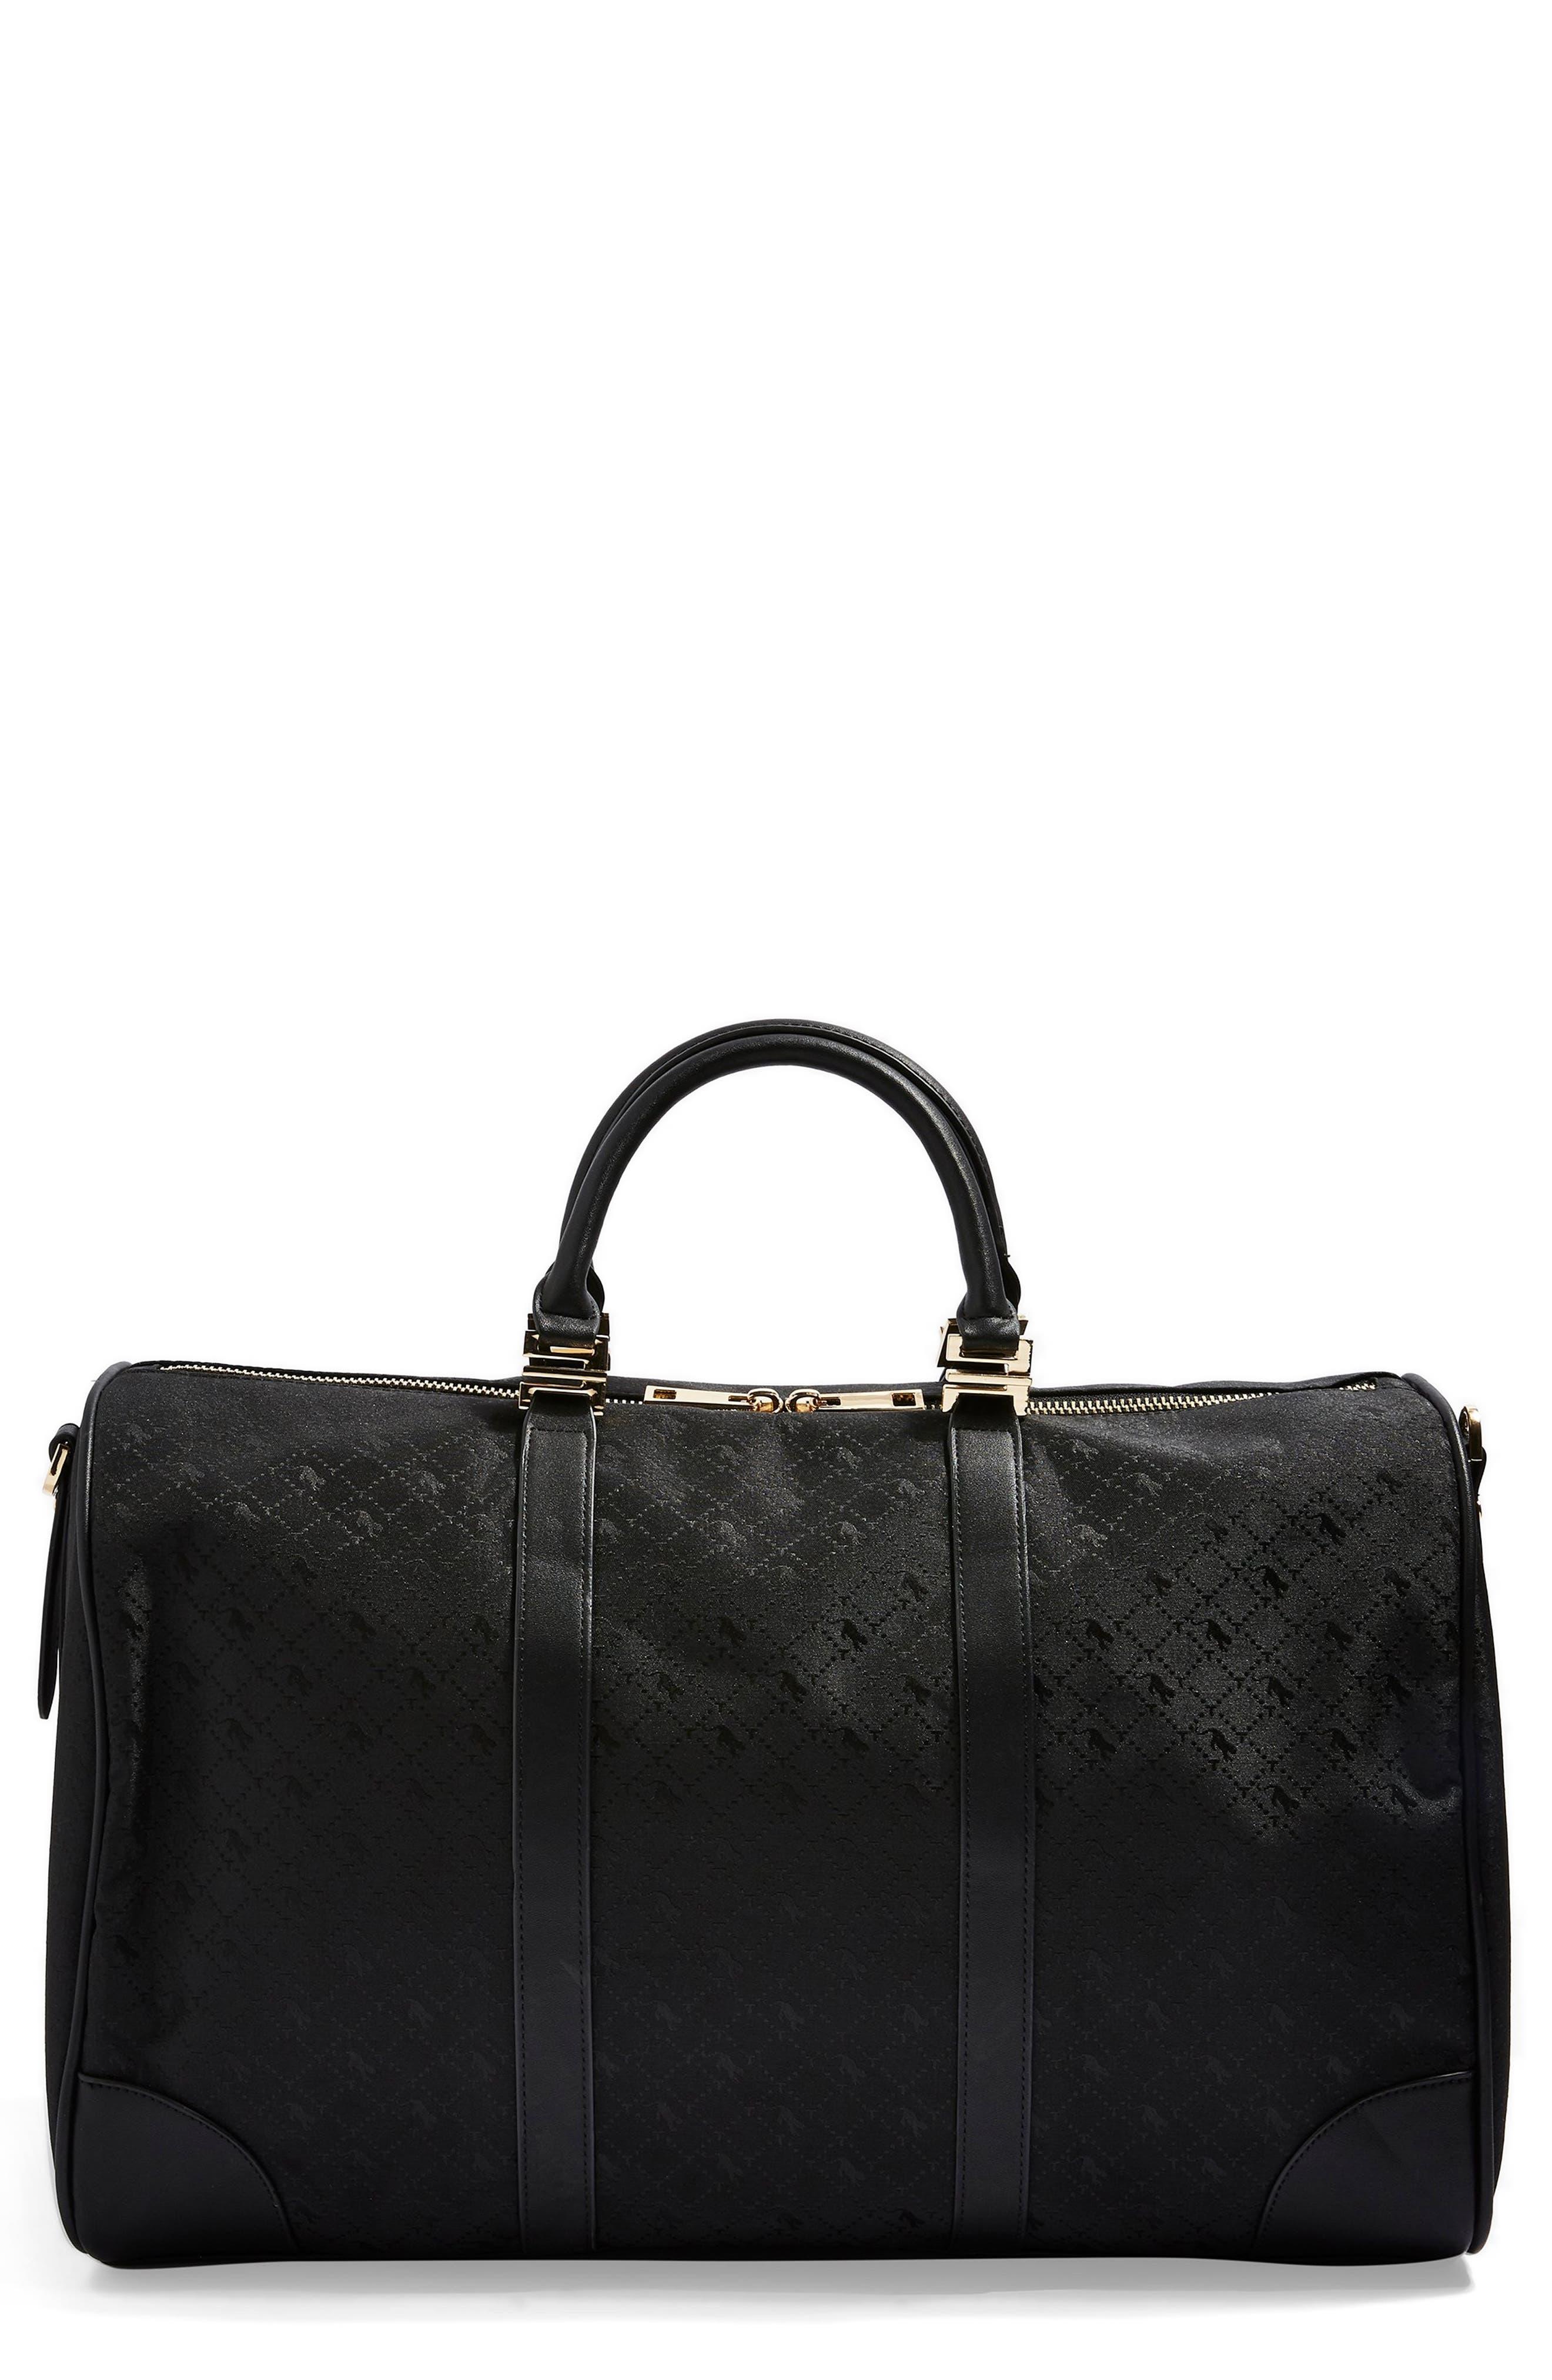 TOPSHOP,                             Large Madrid Duffel Bag,                             Main thumbnail 1, color,                             BLACK